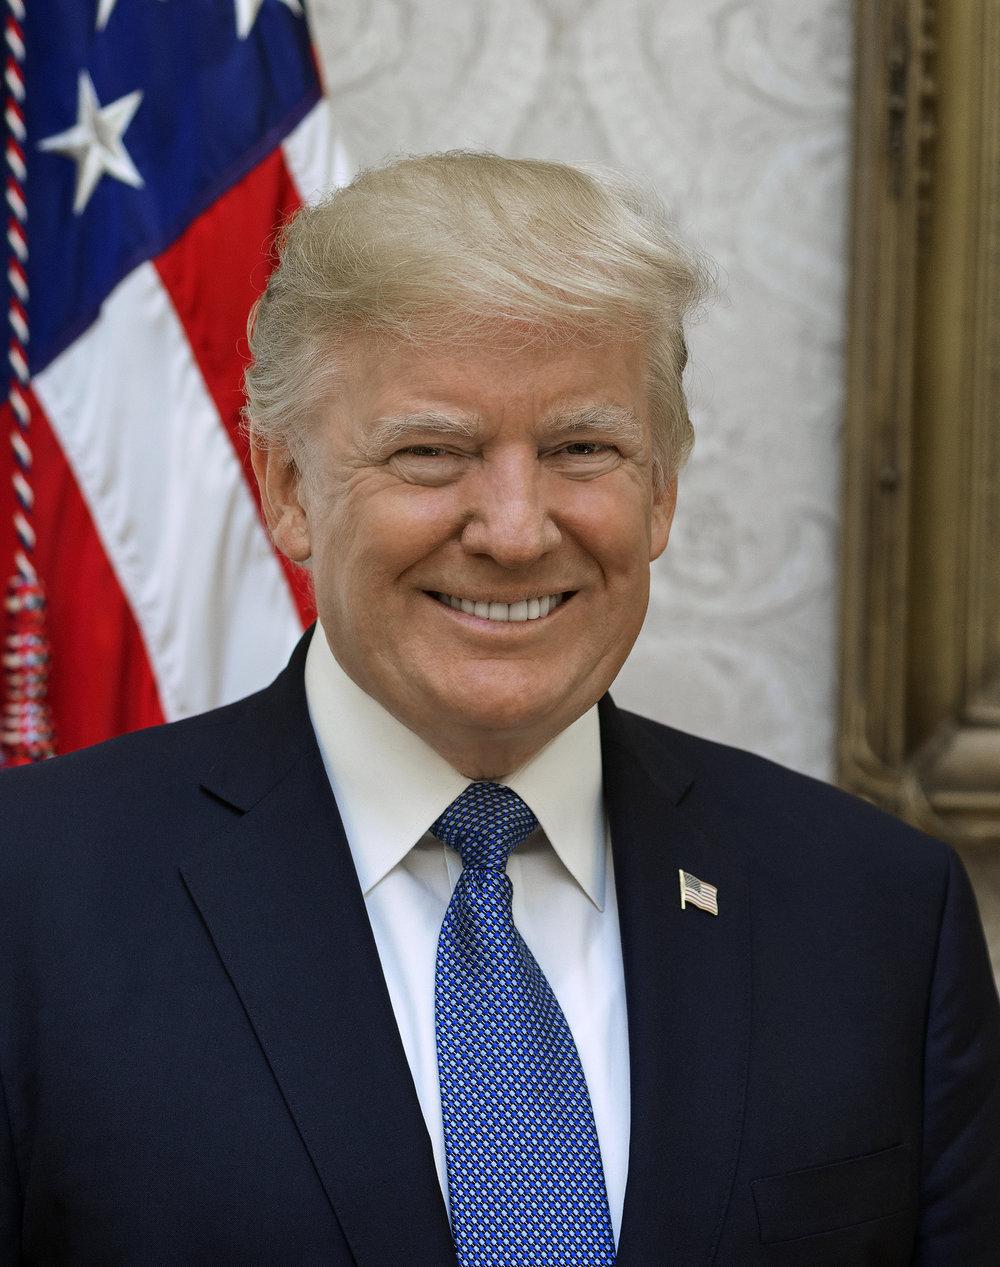 President Donald Trump. Credit:Shealah Craighead/White House.